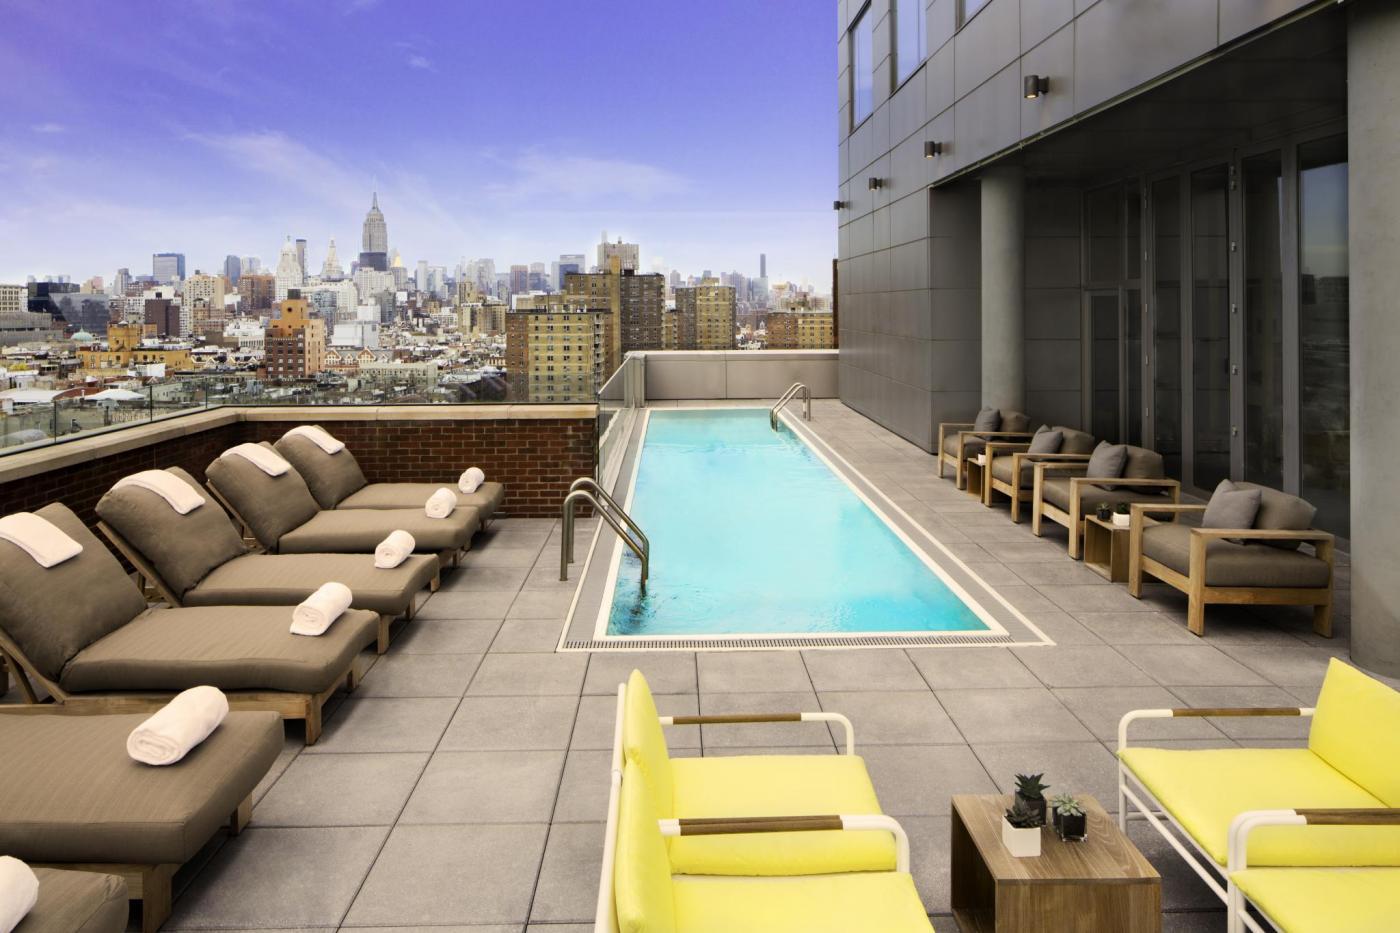 Mr Purple rooftop pool | photo cred: Gerber Group